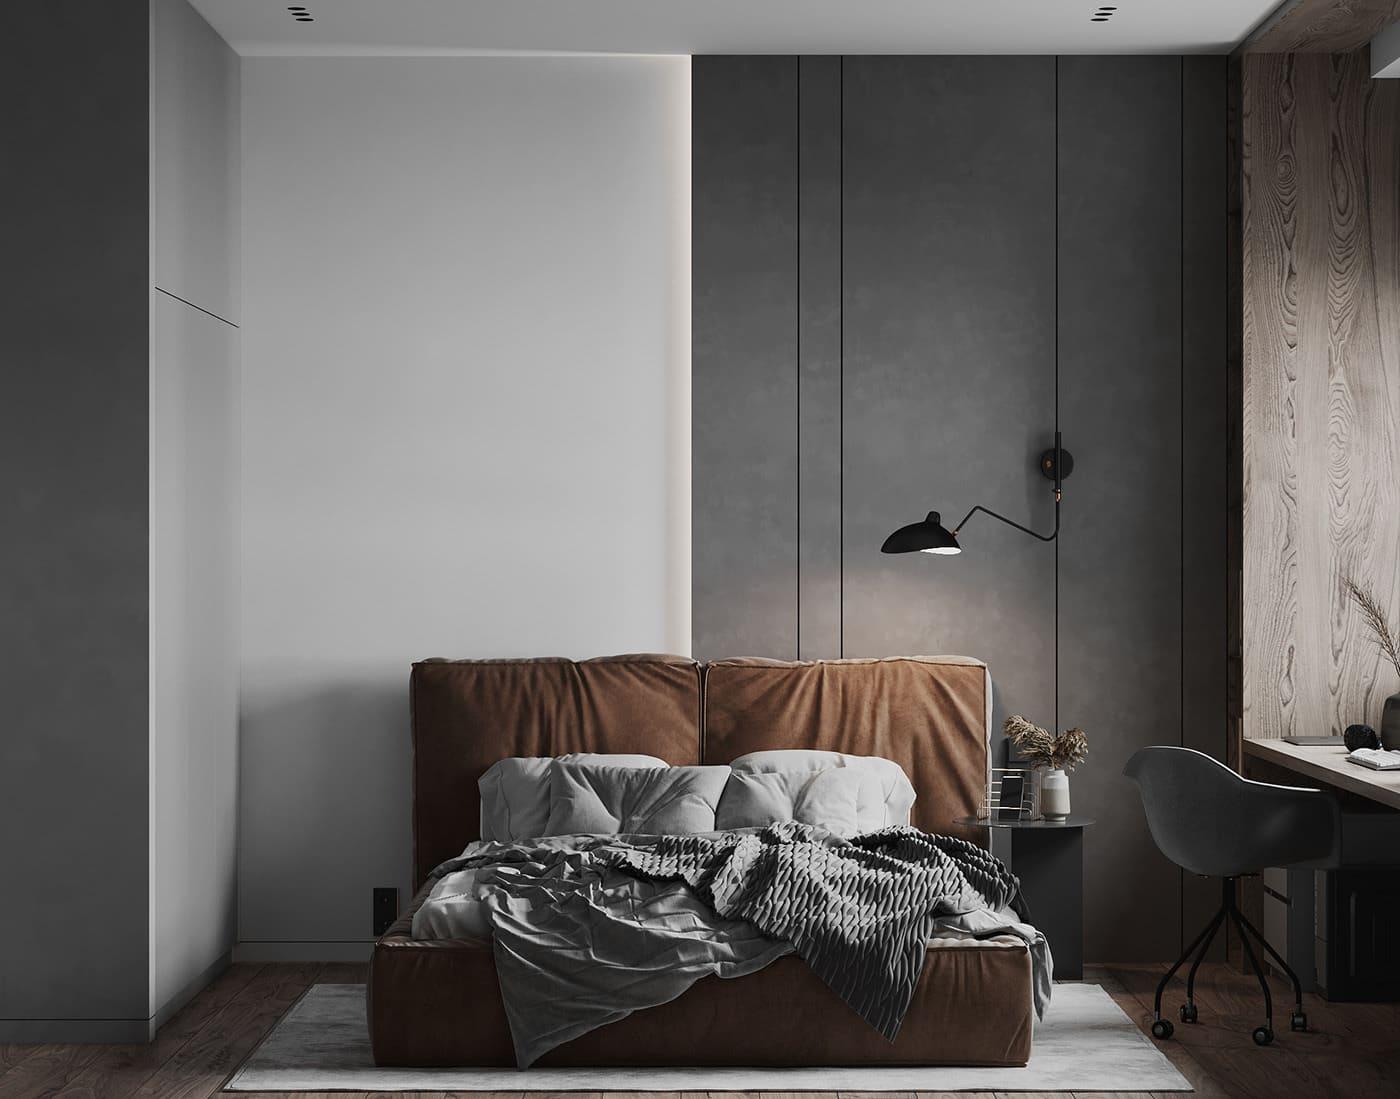 модный дизайн интерьера квартиры фото 9